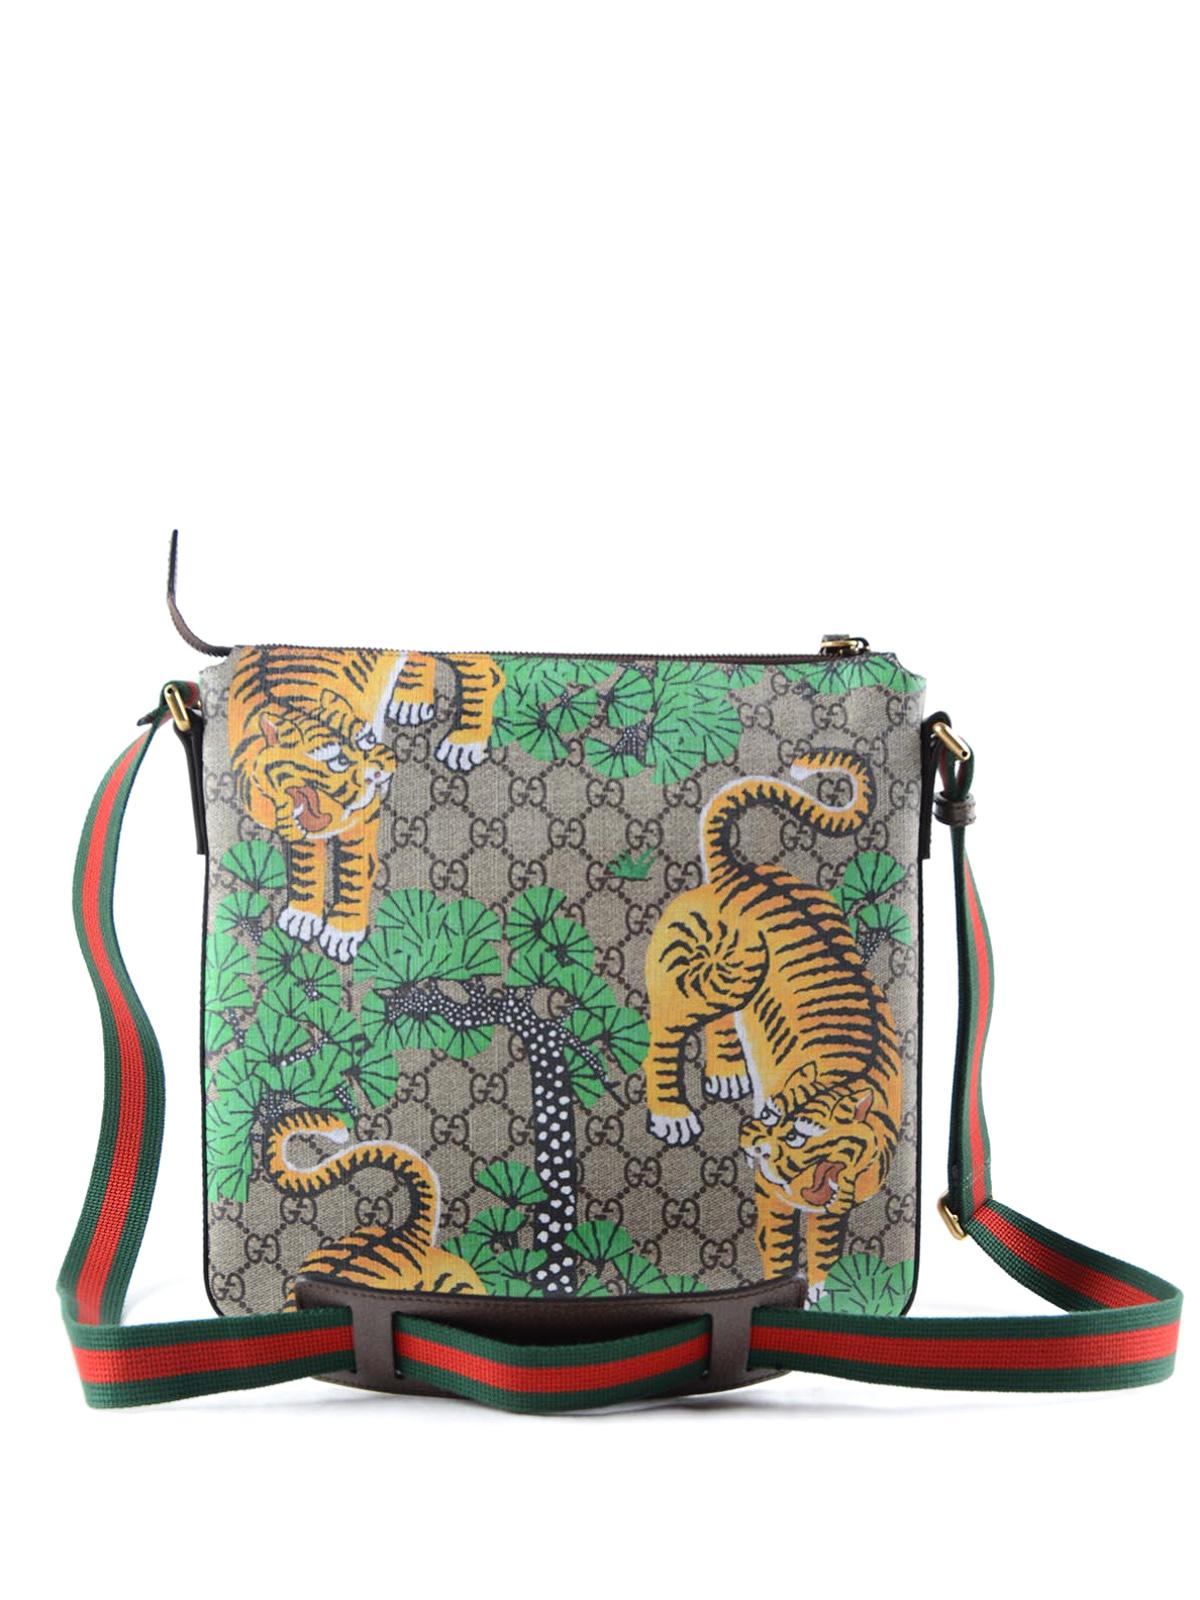 43aac09485aefc Gucci - Gucci Bengal crossbody - shoulder bags - 406408 K5P1T 8860